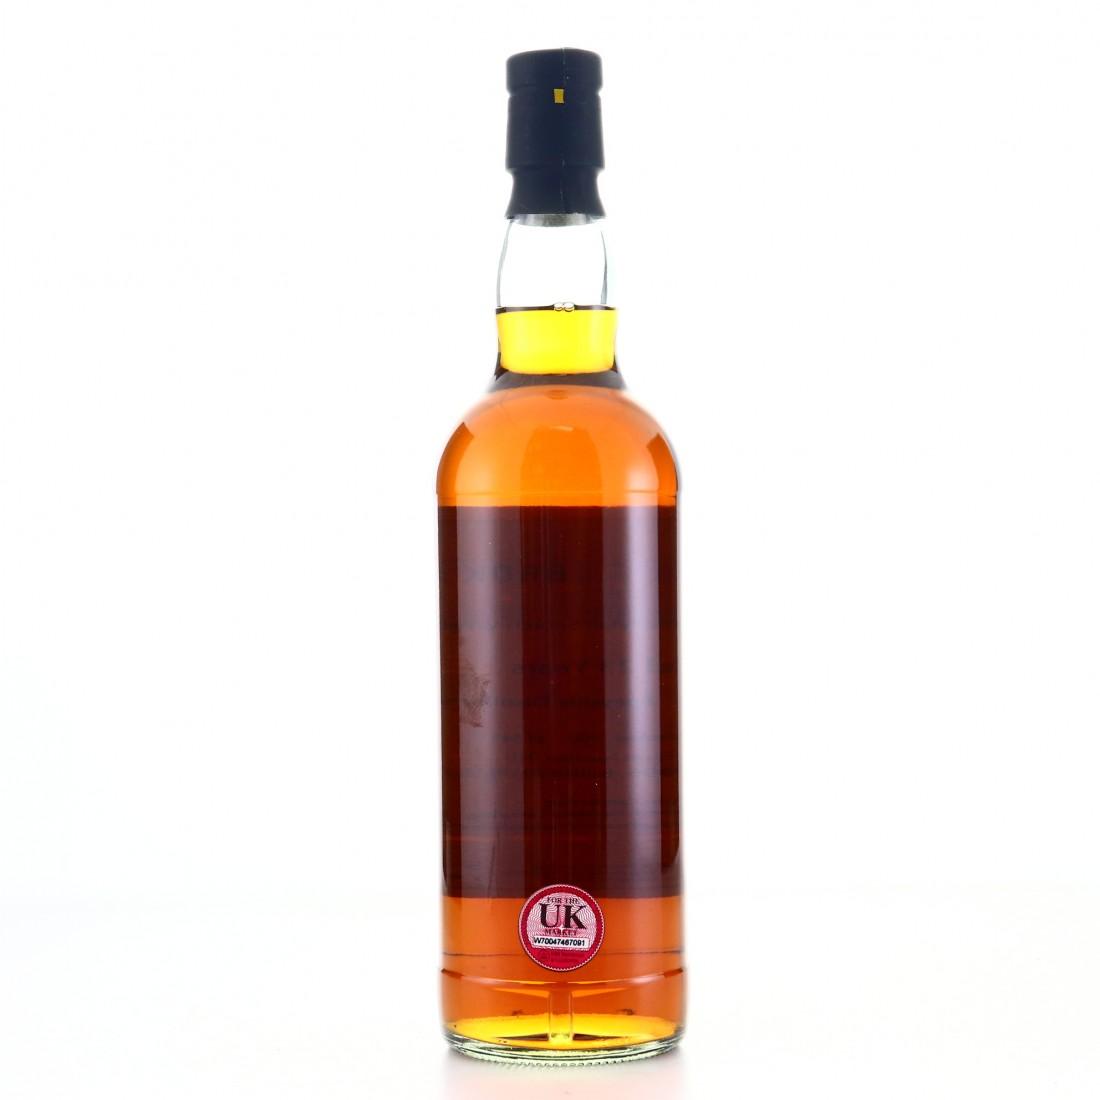 Speyside 1996 Whisky Broker 23 Year Old